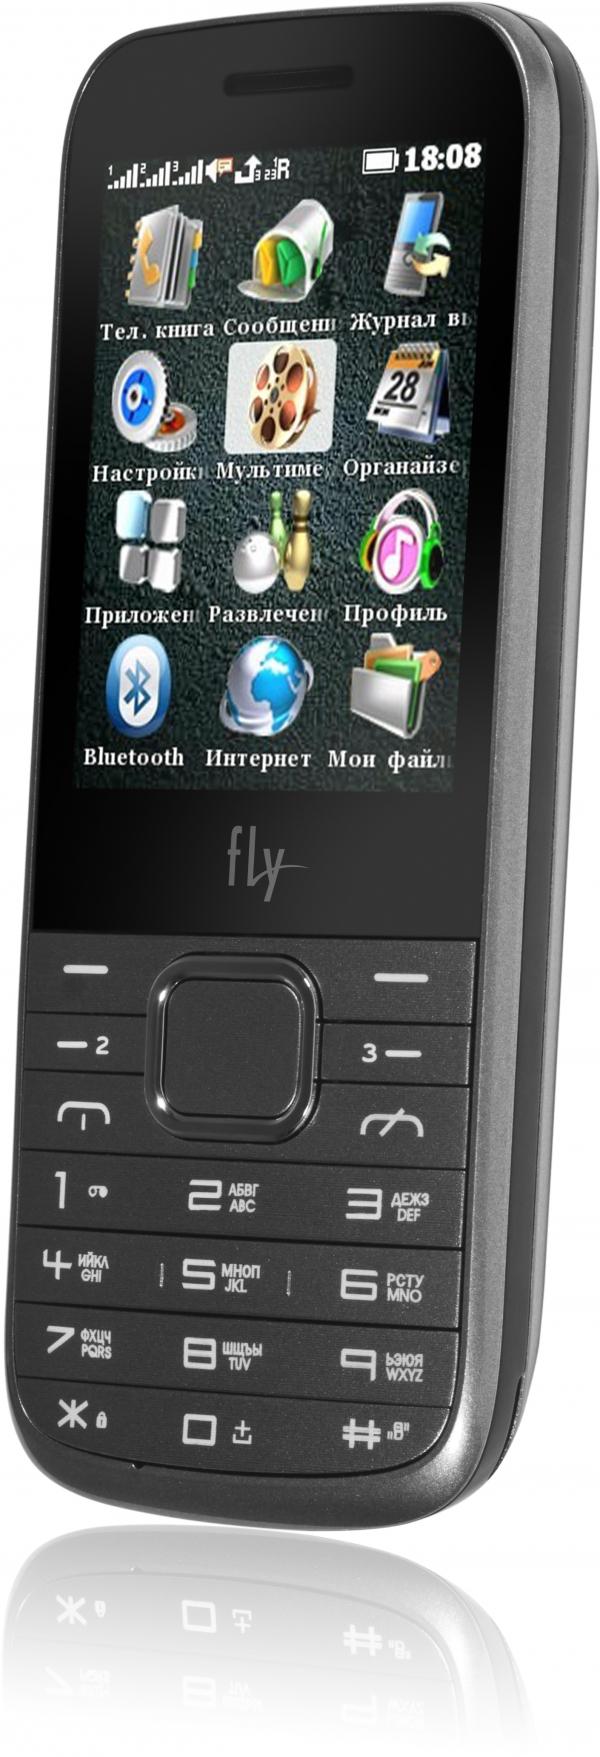 Фото с мобільними телефонами 1 фотография